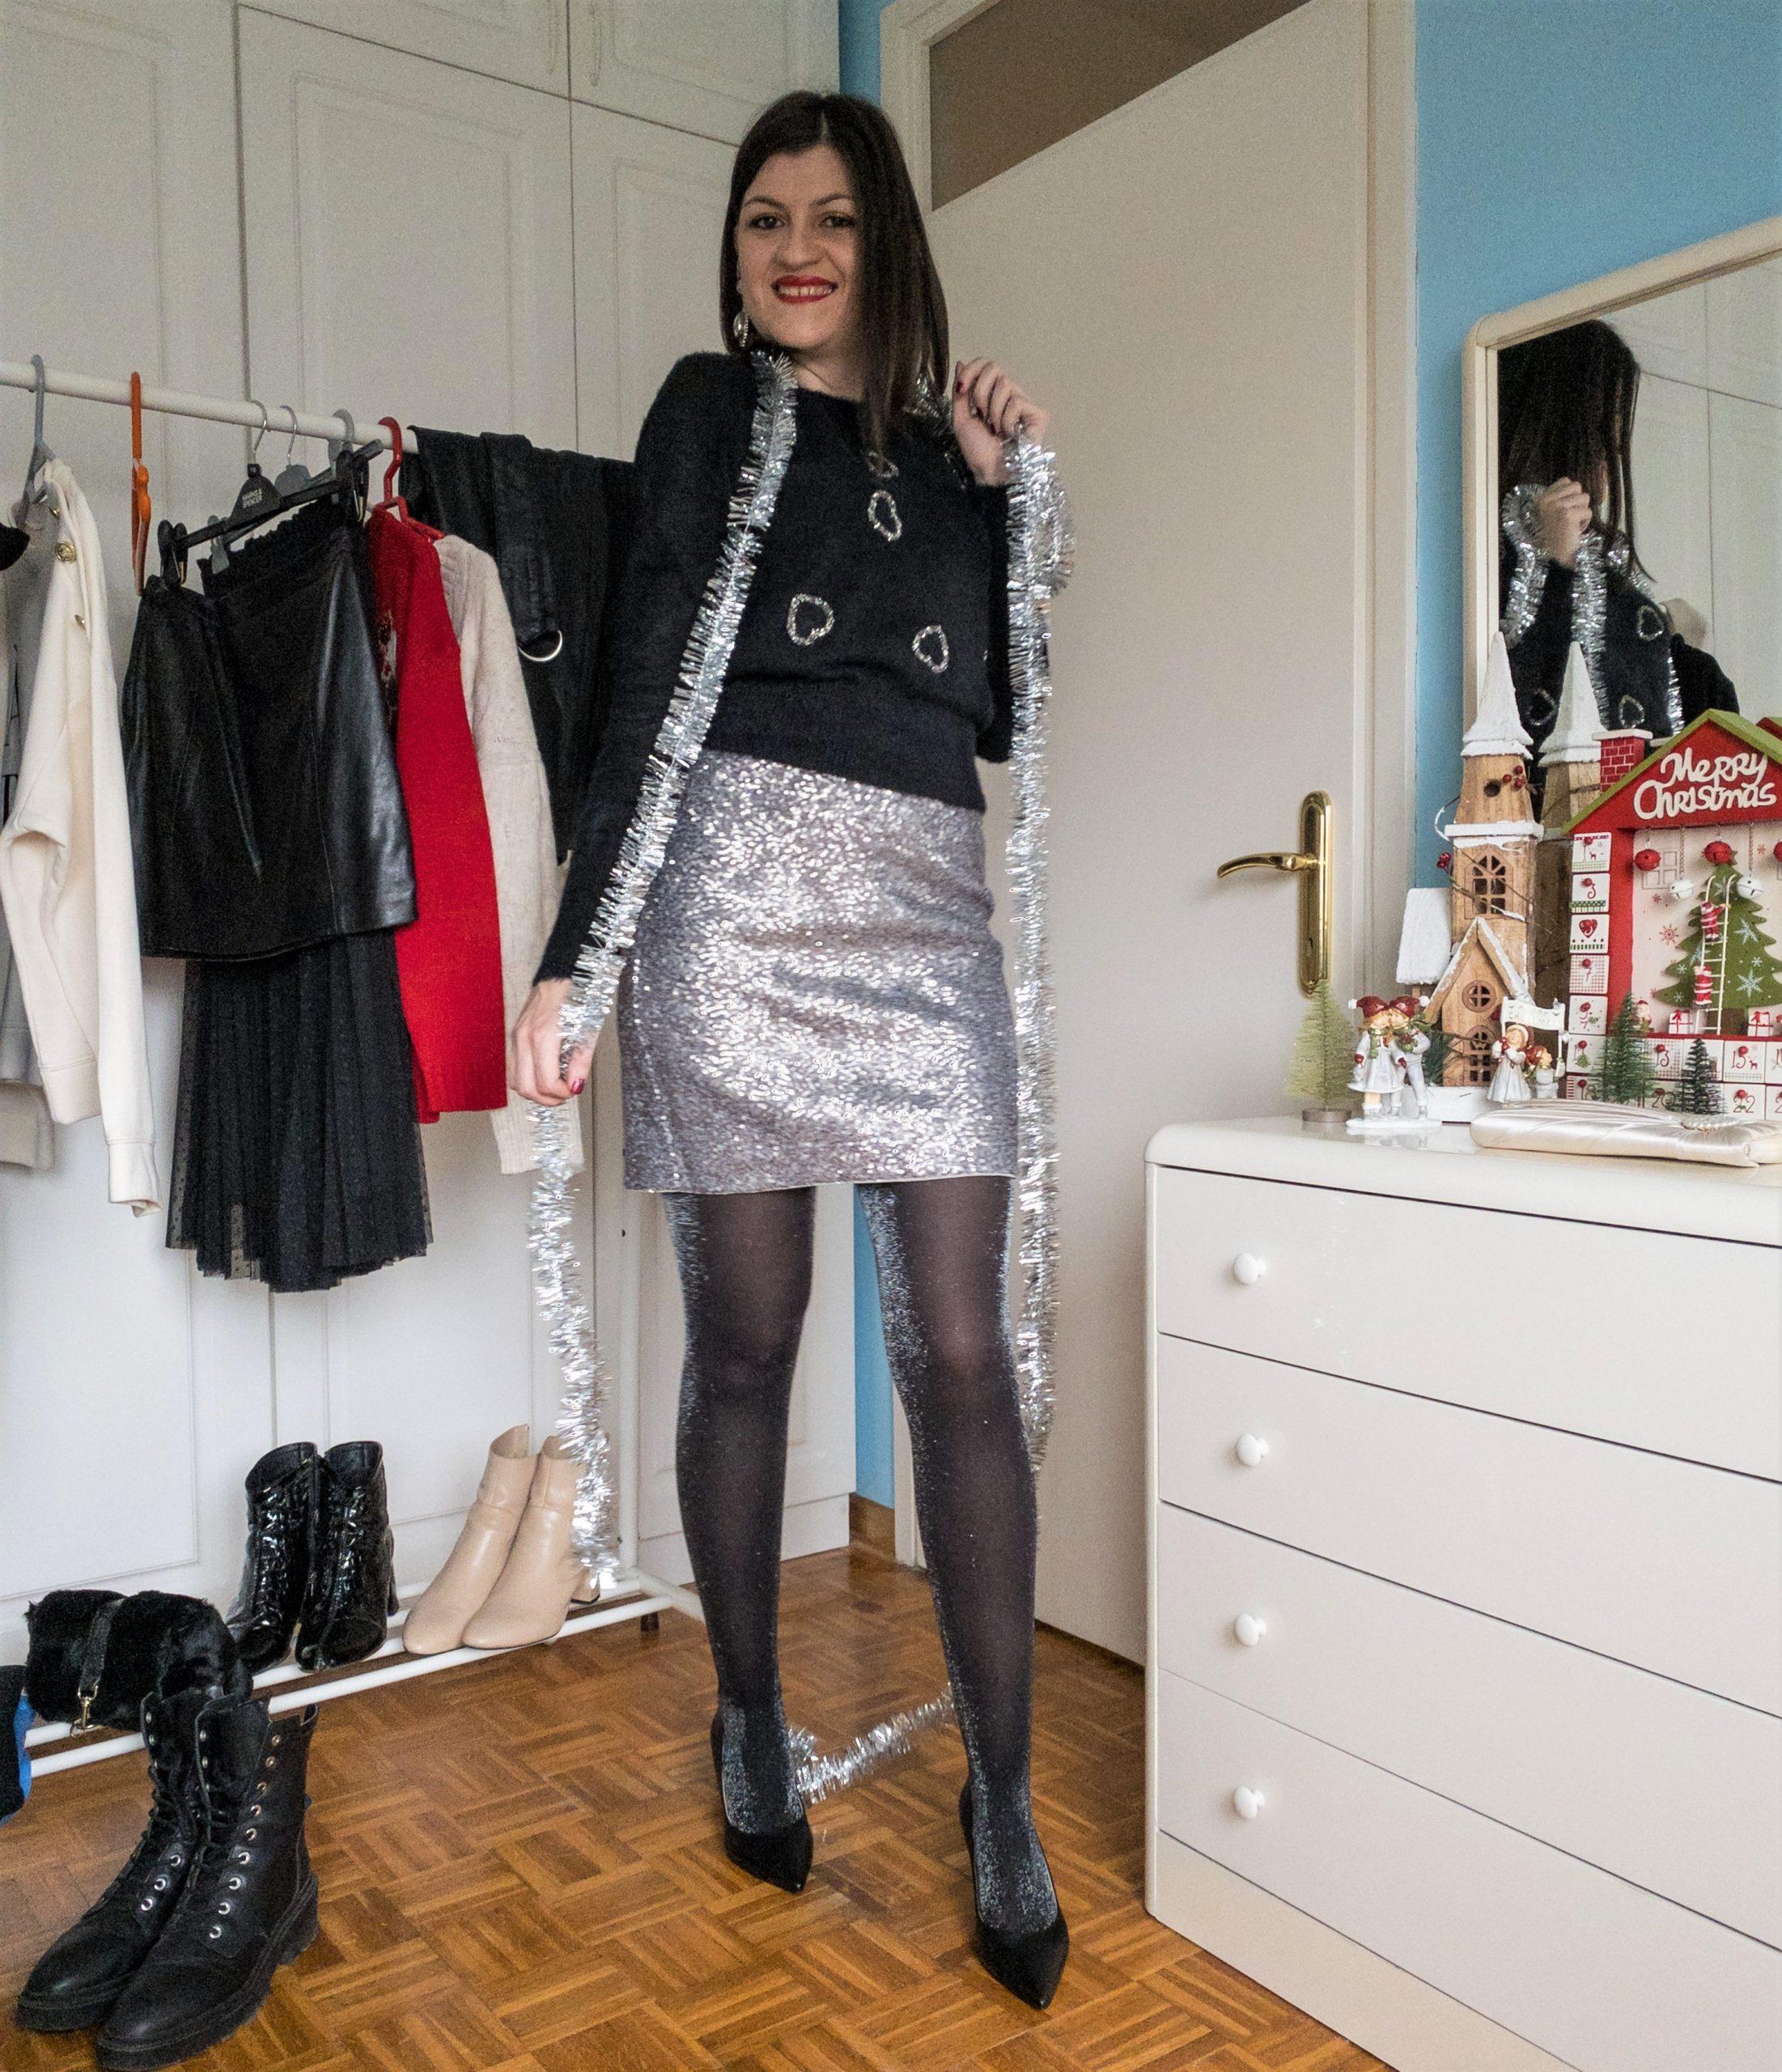 Outfit Ideas for Xmas Season